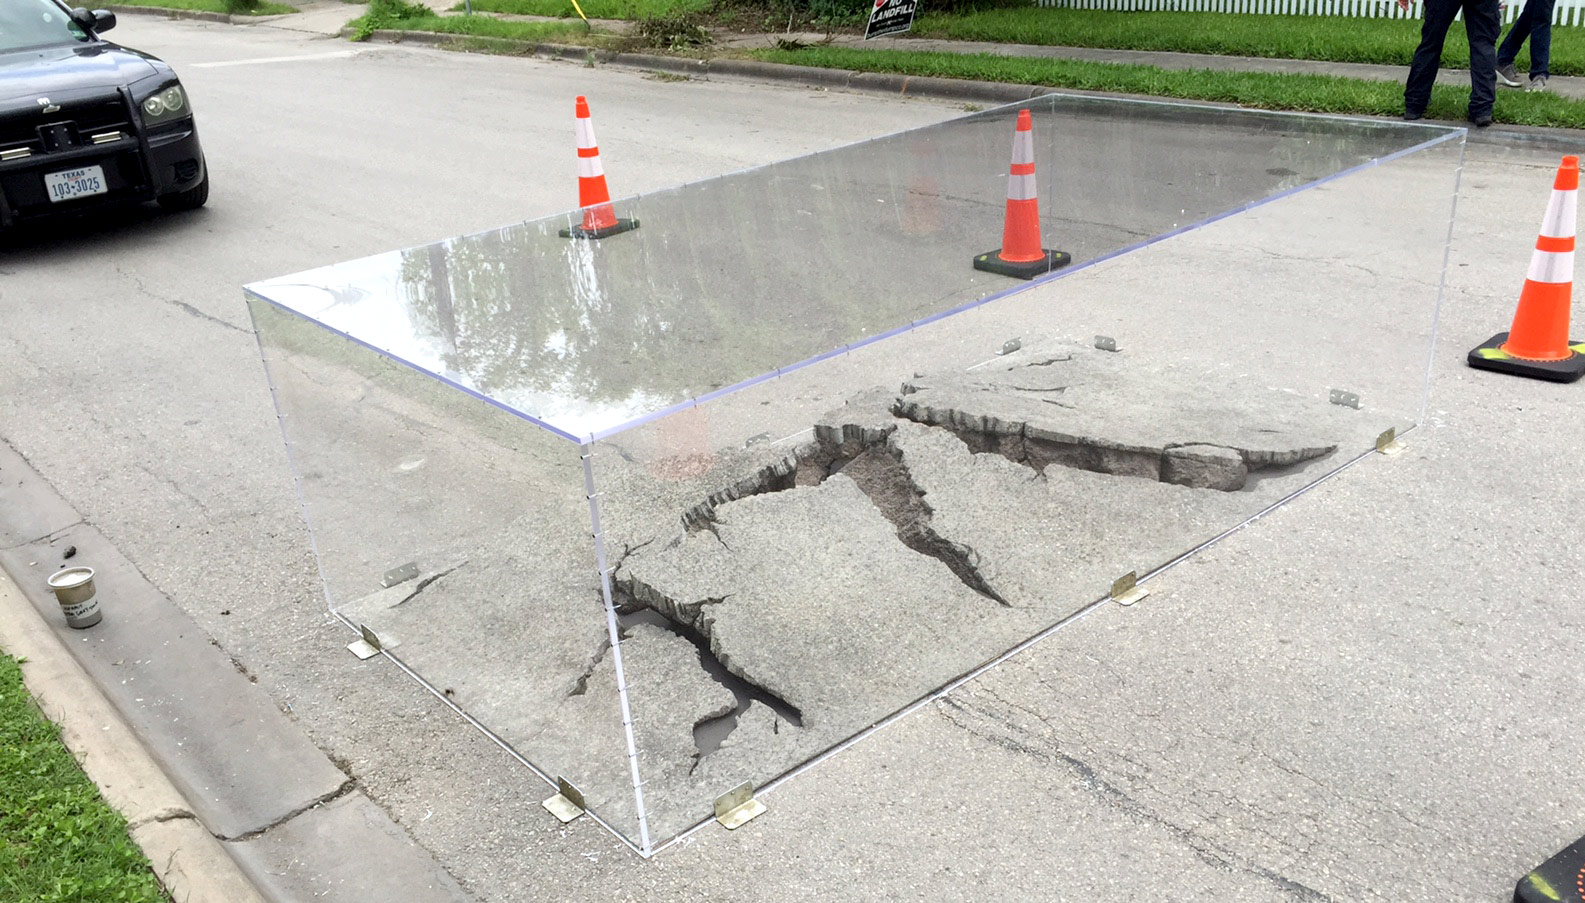 Large crack in road